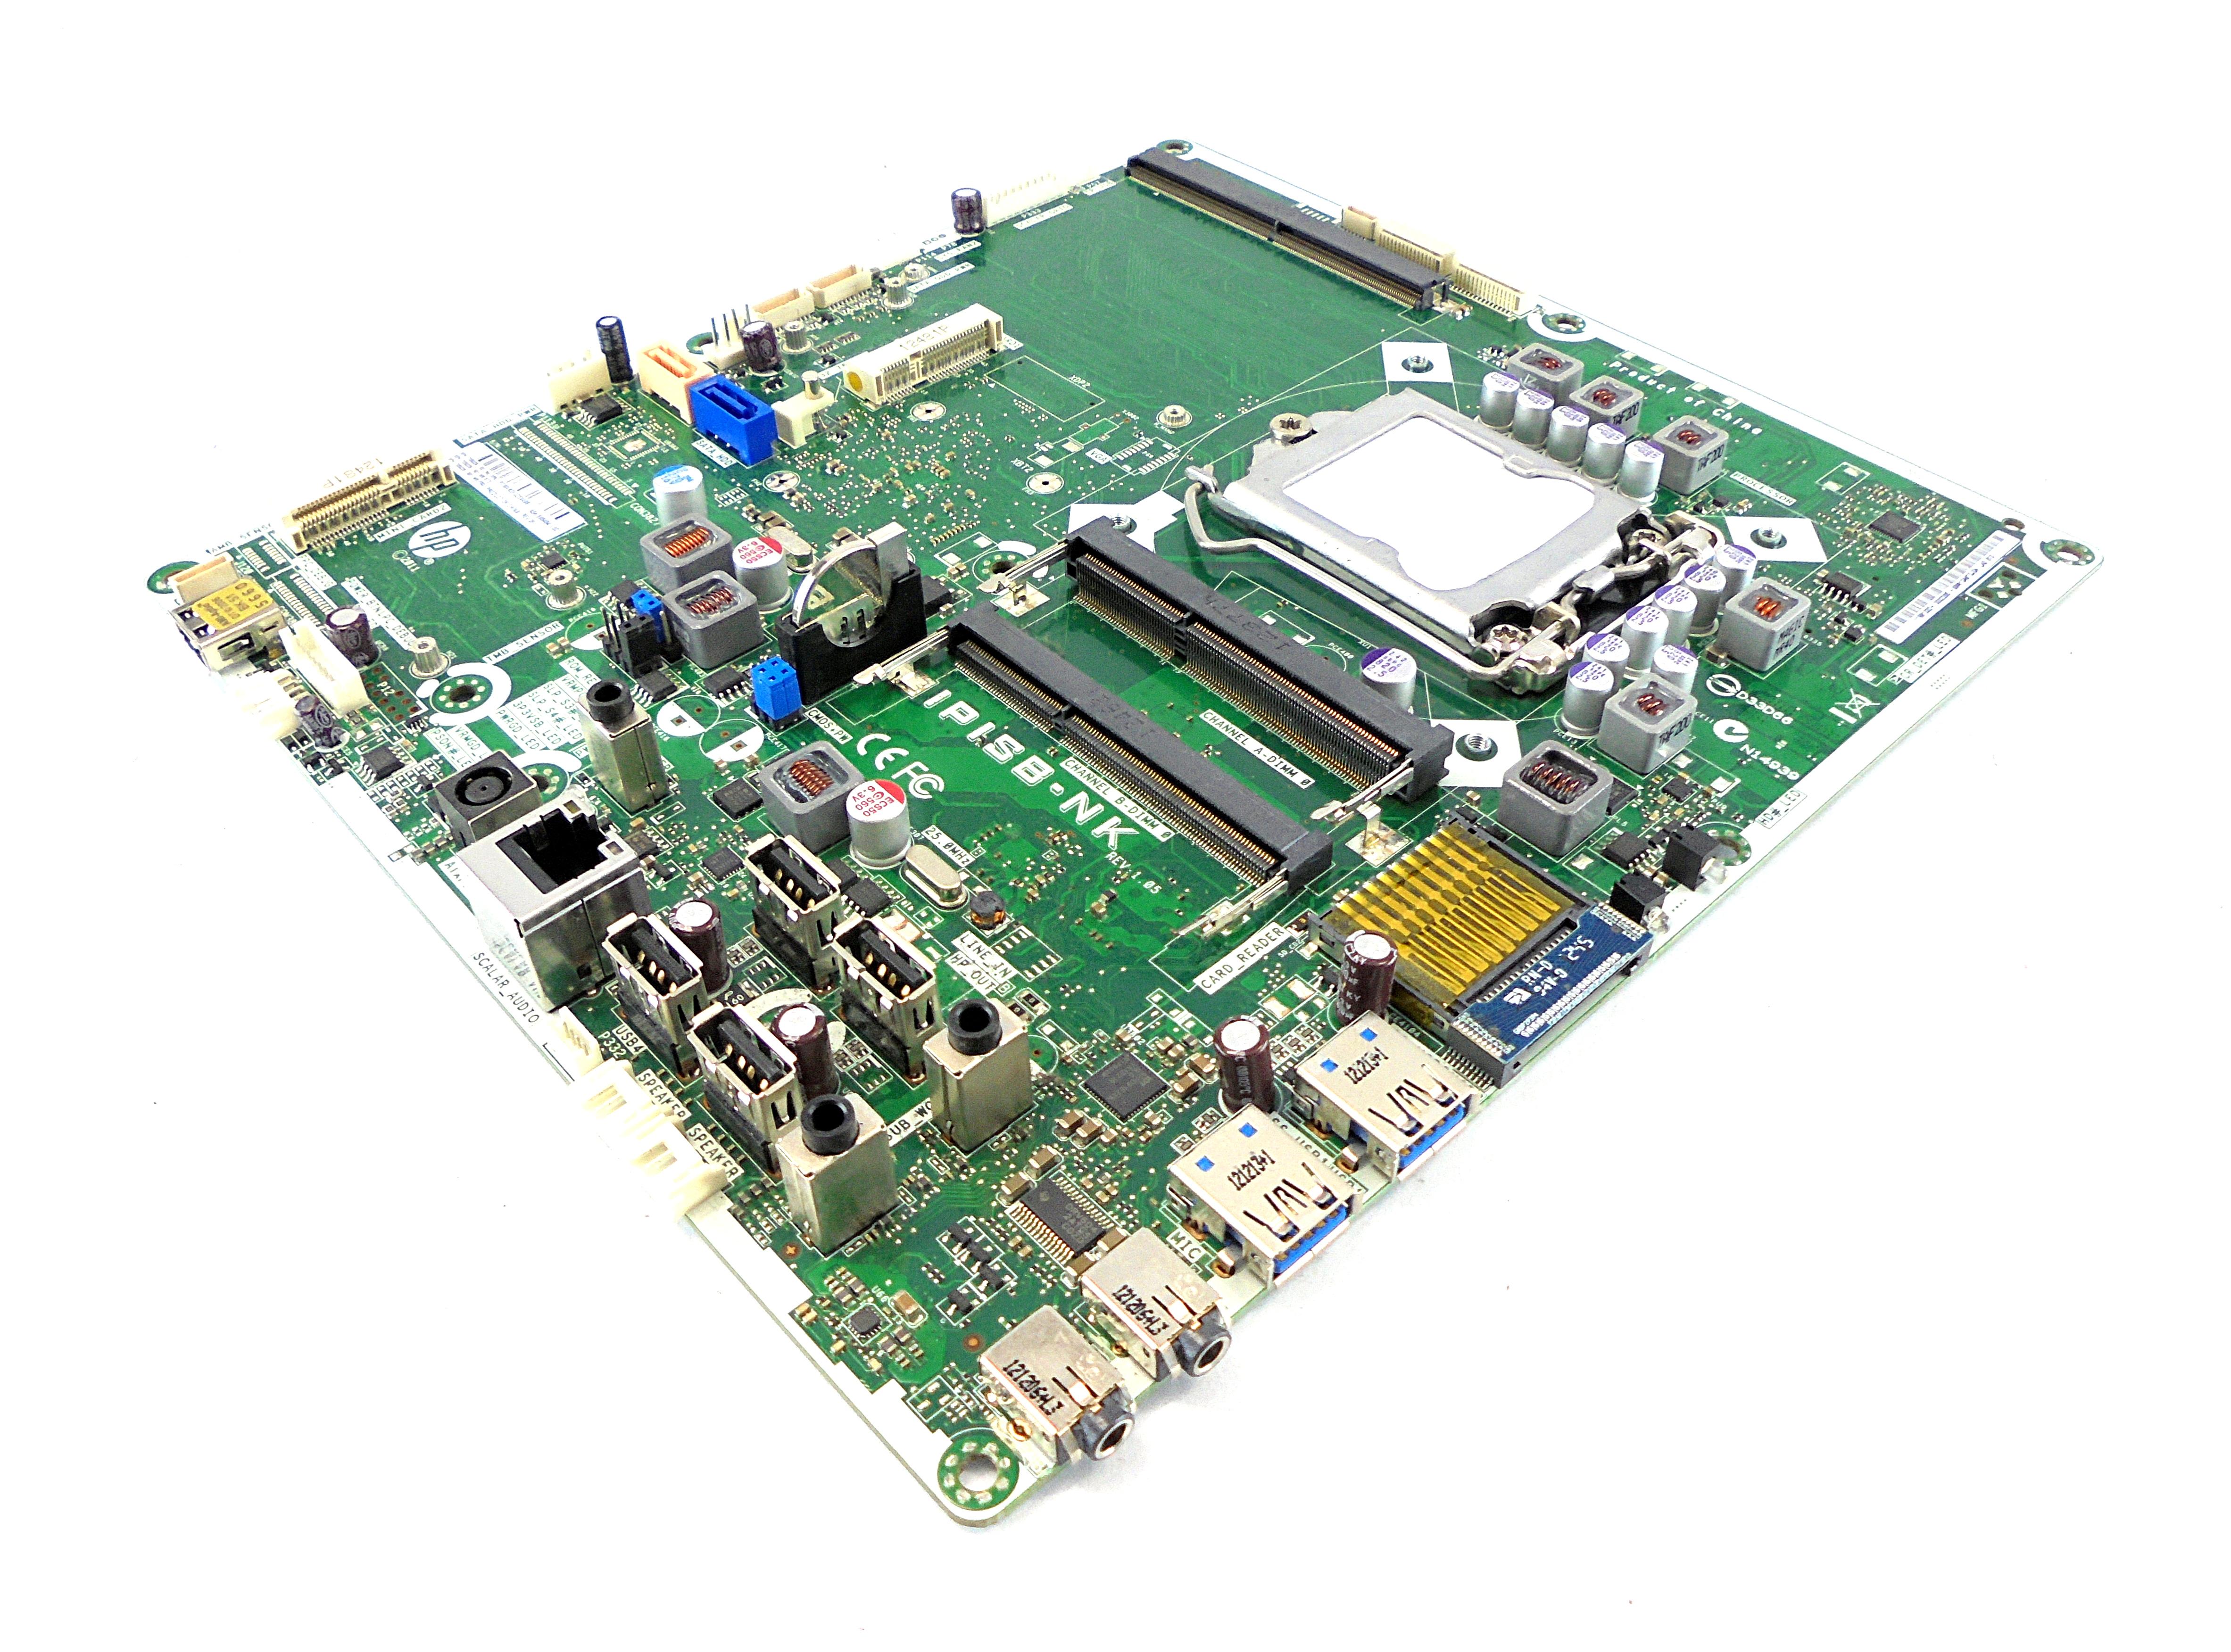 696484-001 IPISB-NK HP Touchsmart Motherboard #SP 705028-001